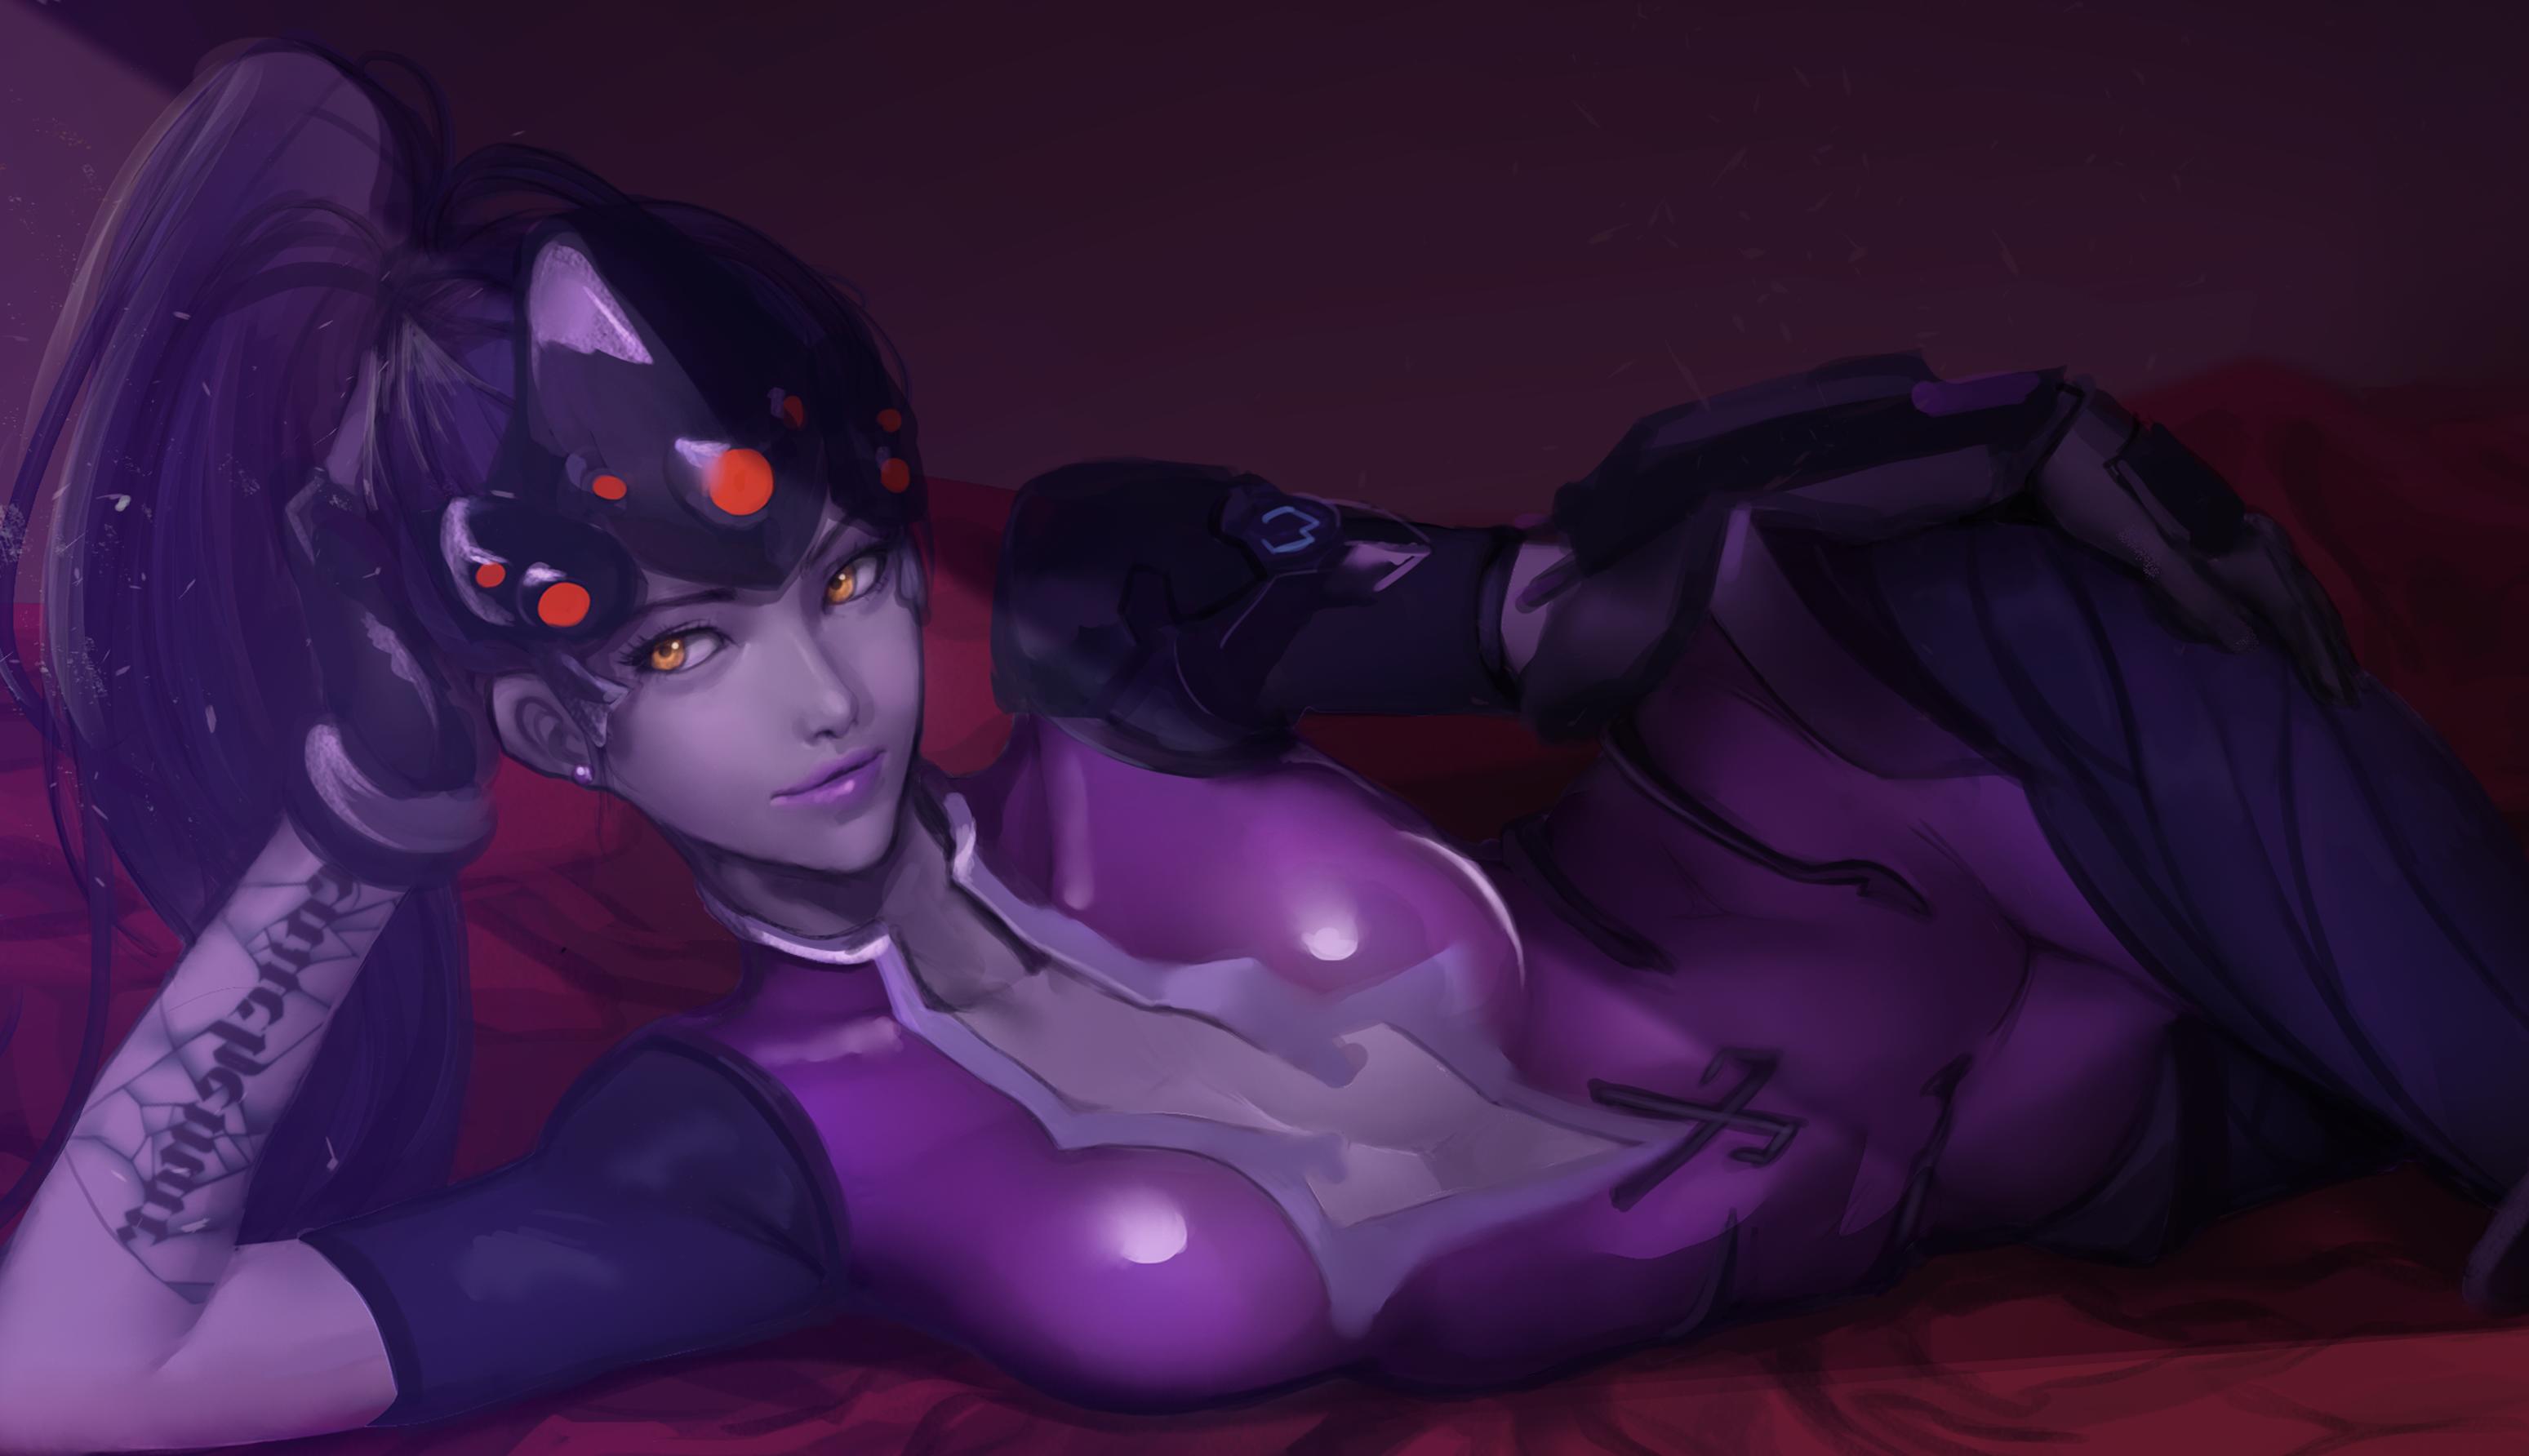 Amelie Lacroix Long Hair Lying Down Overwatch Ponytail Purple Hair Tattoo Widowmaker Overwatch Yello 3098x1784